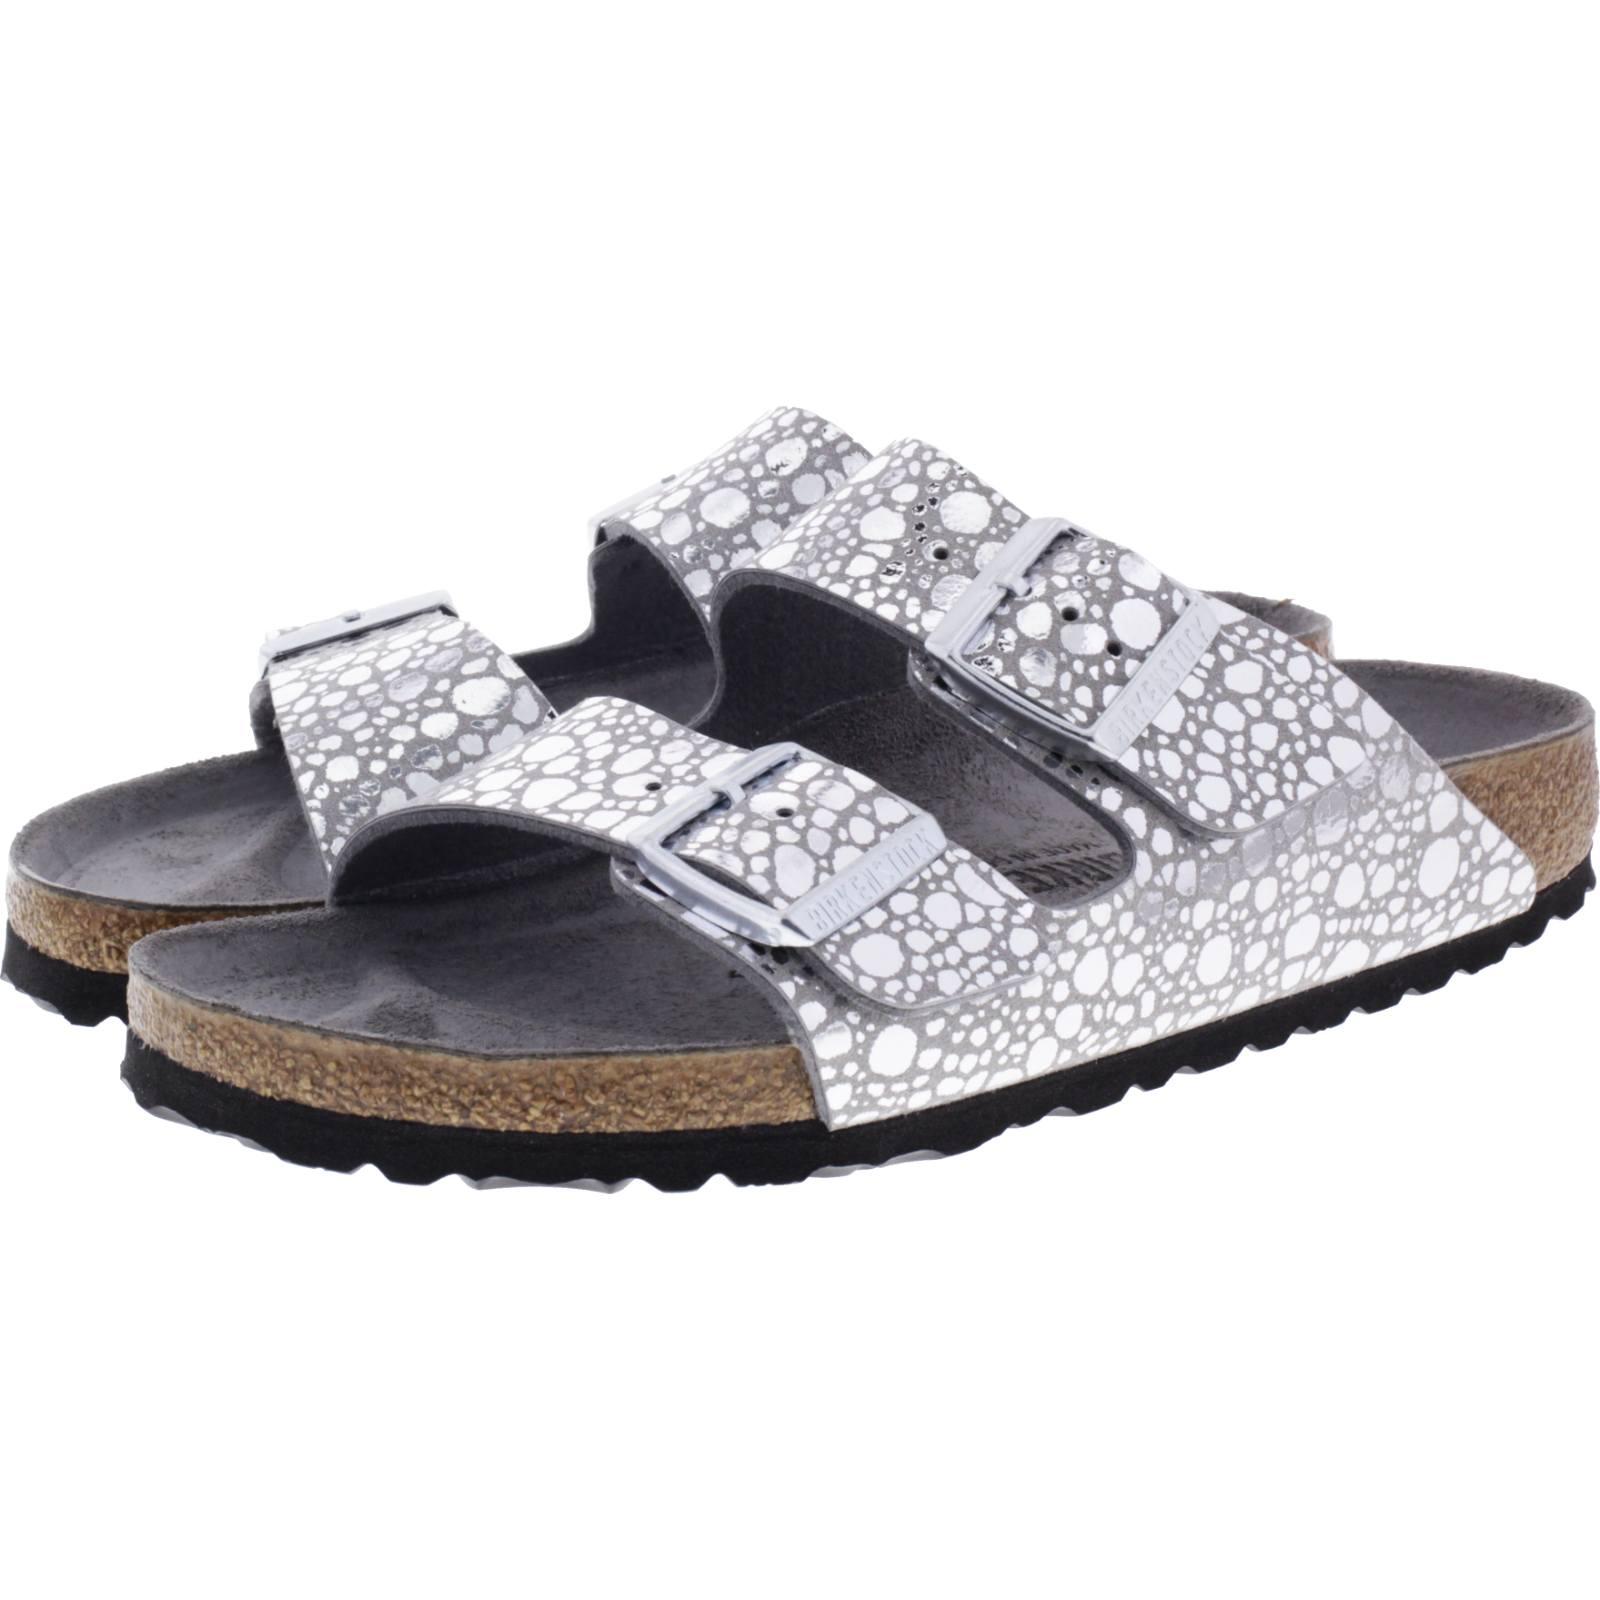 ed1a3b4eec1 ... Vorschau  Birkenstock   Modell  Arizona   Metallic Stones Silver Gray    Weite  Schmal ...